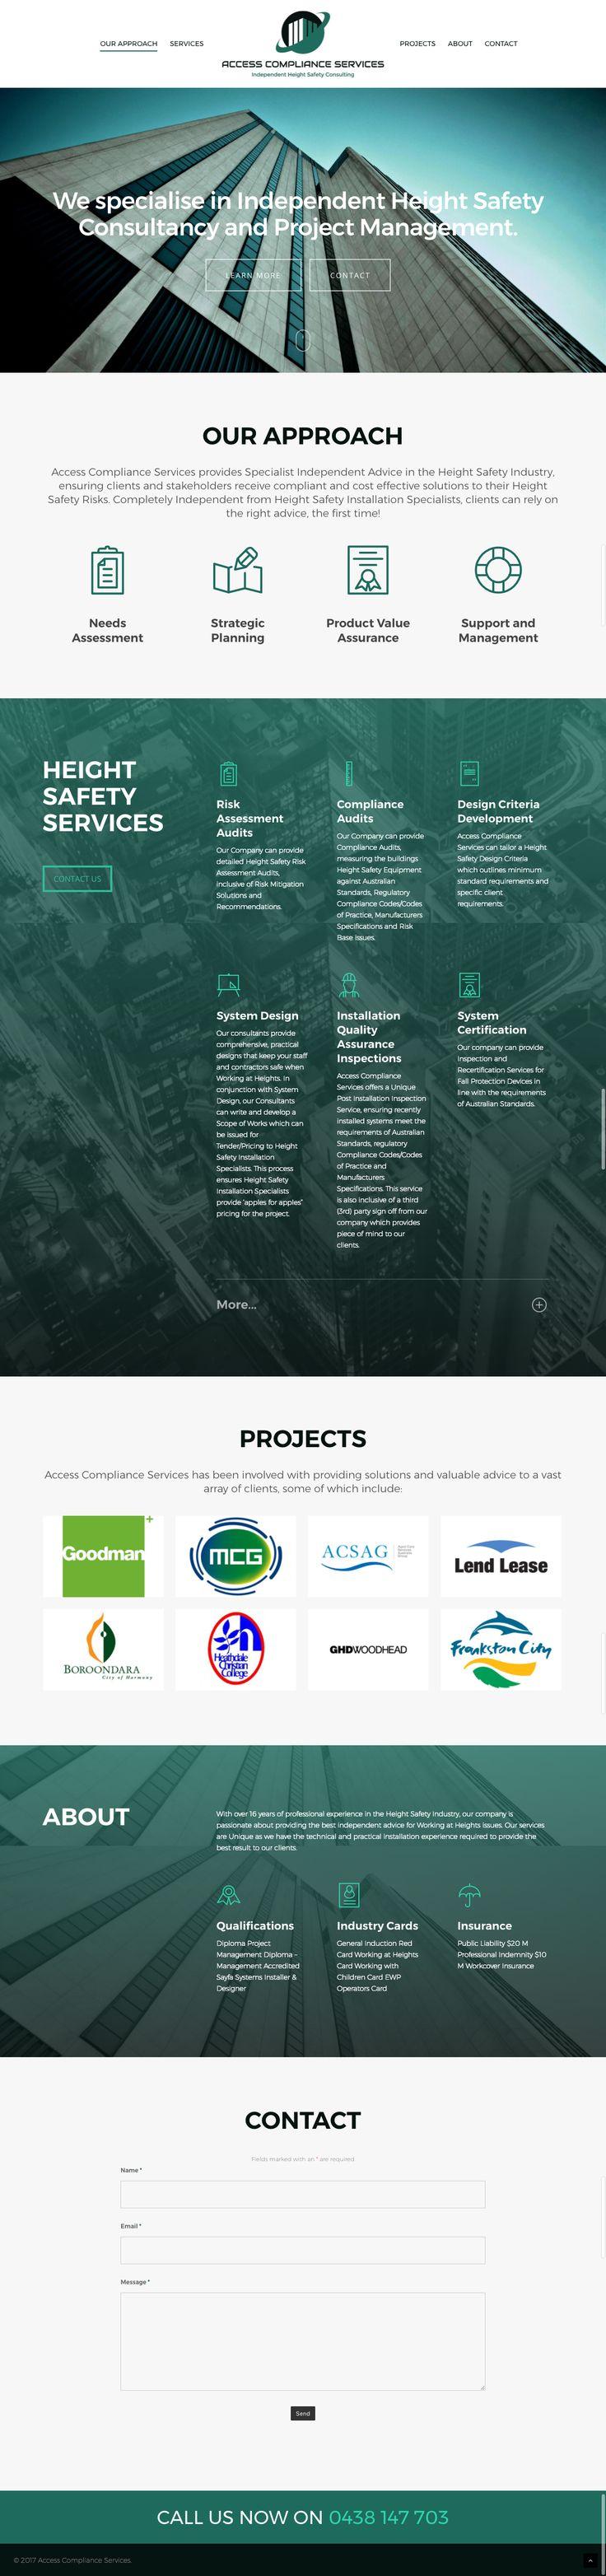 Responsive website UI for height safety consultancy business. Made by KORE. #website #responsive #design #designinspiration #webdesign #UI